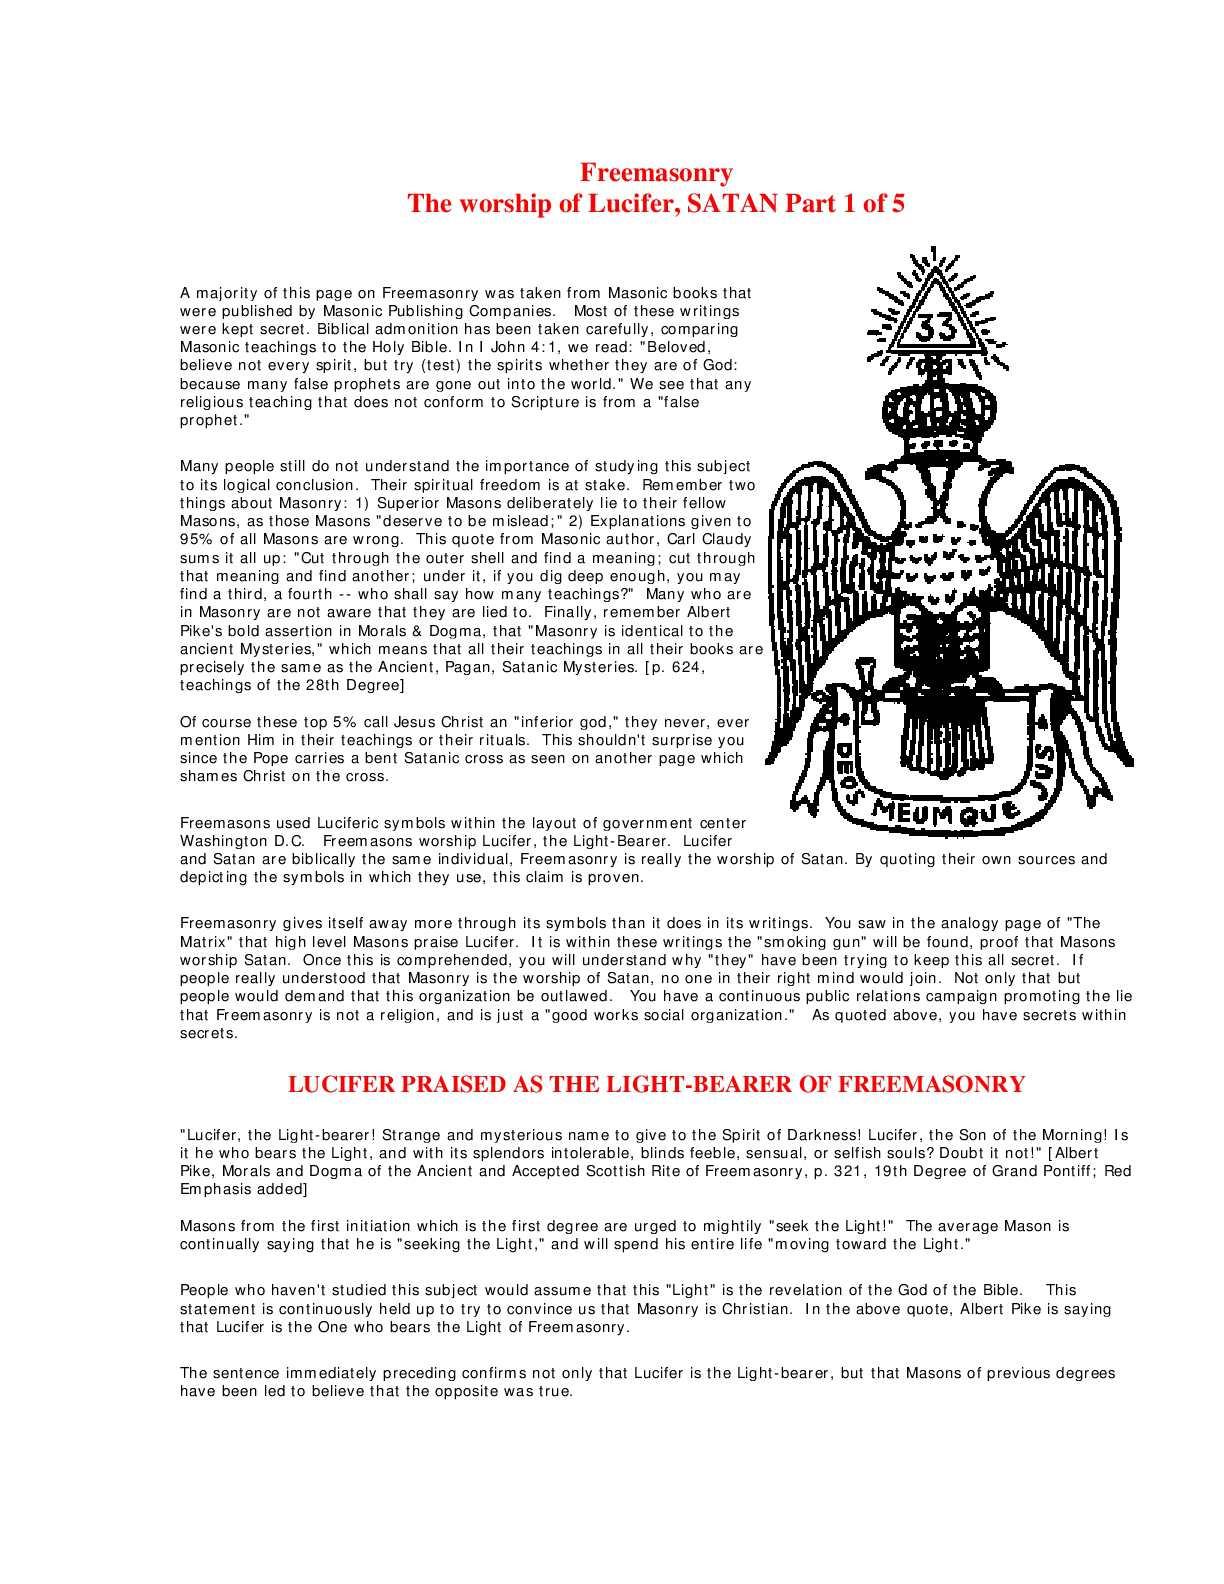 Calaméo - David Icke - Freemasons,Satanism and Symbolism